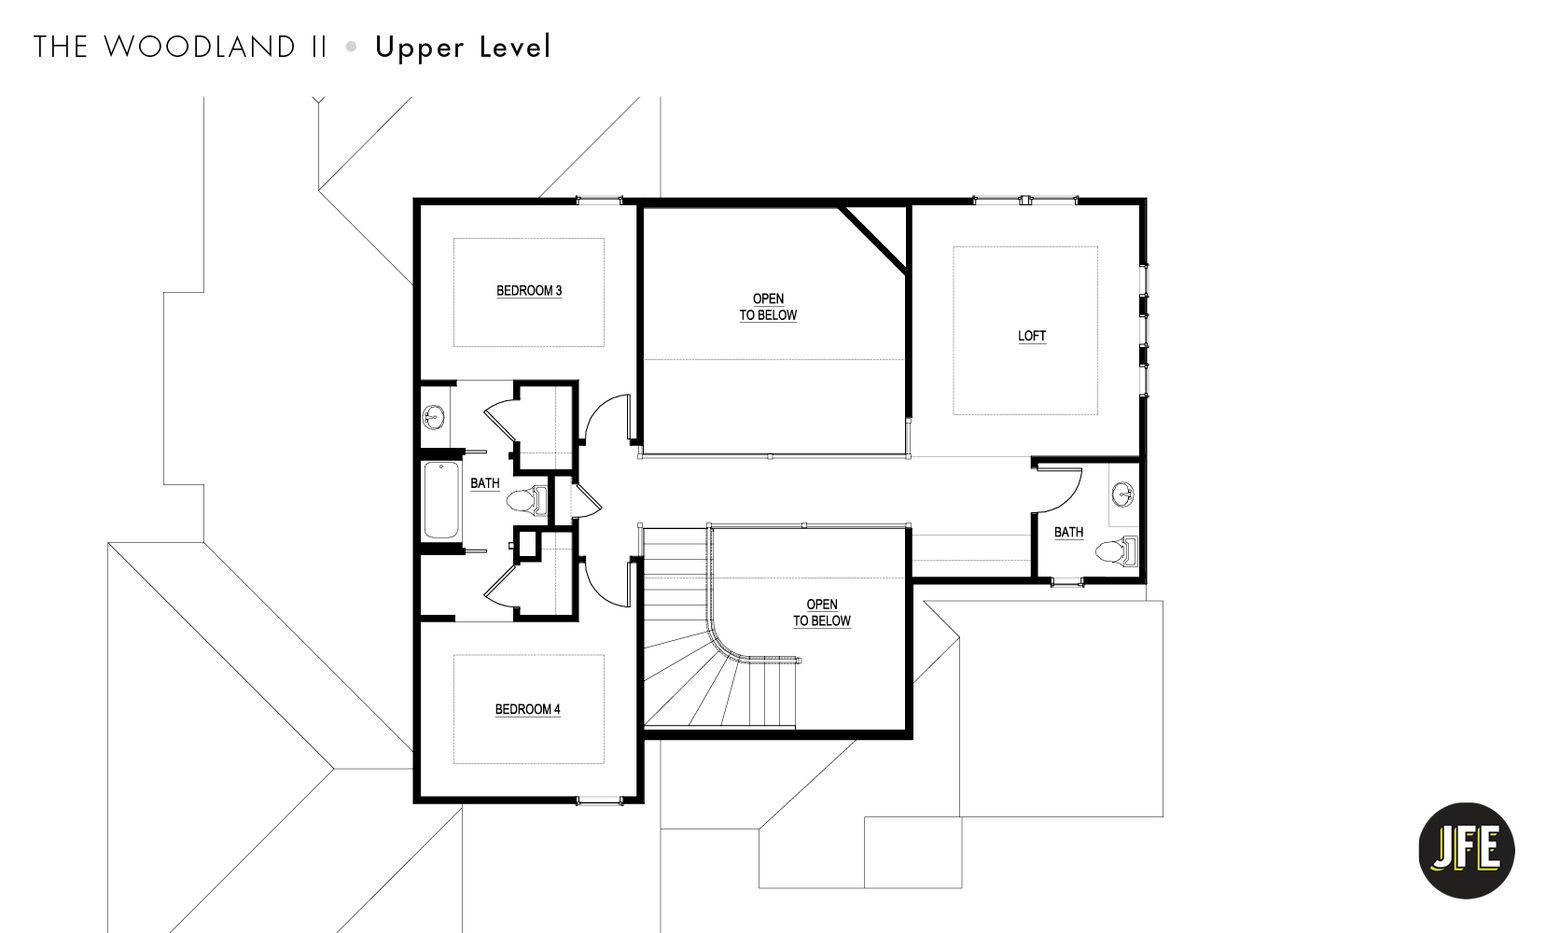 The-Woodland-II-Upper-Level.jpg